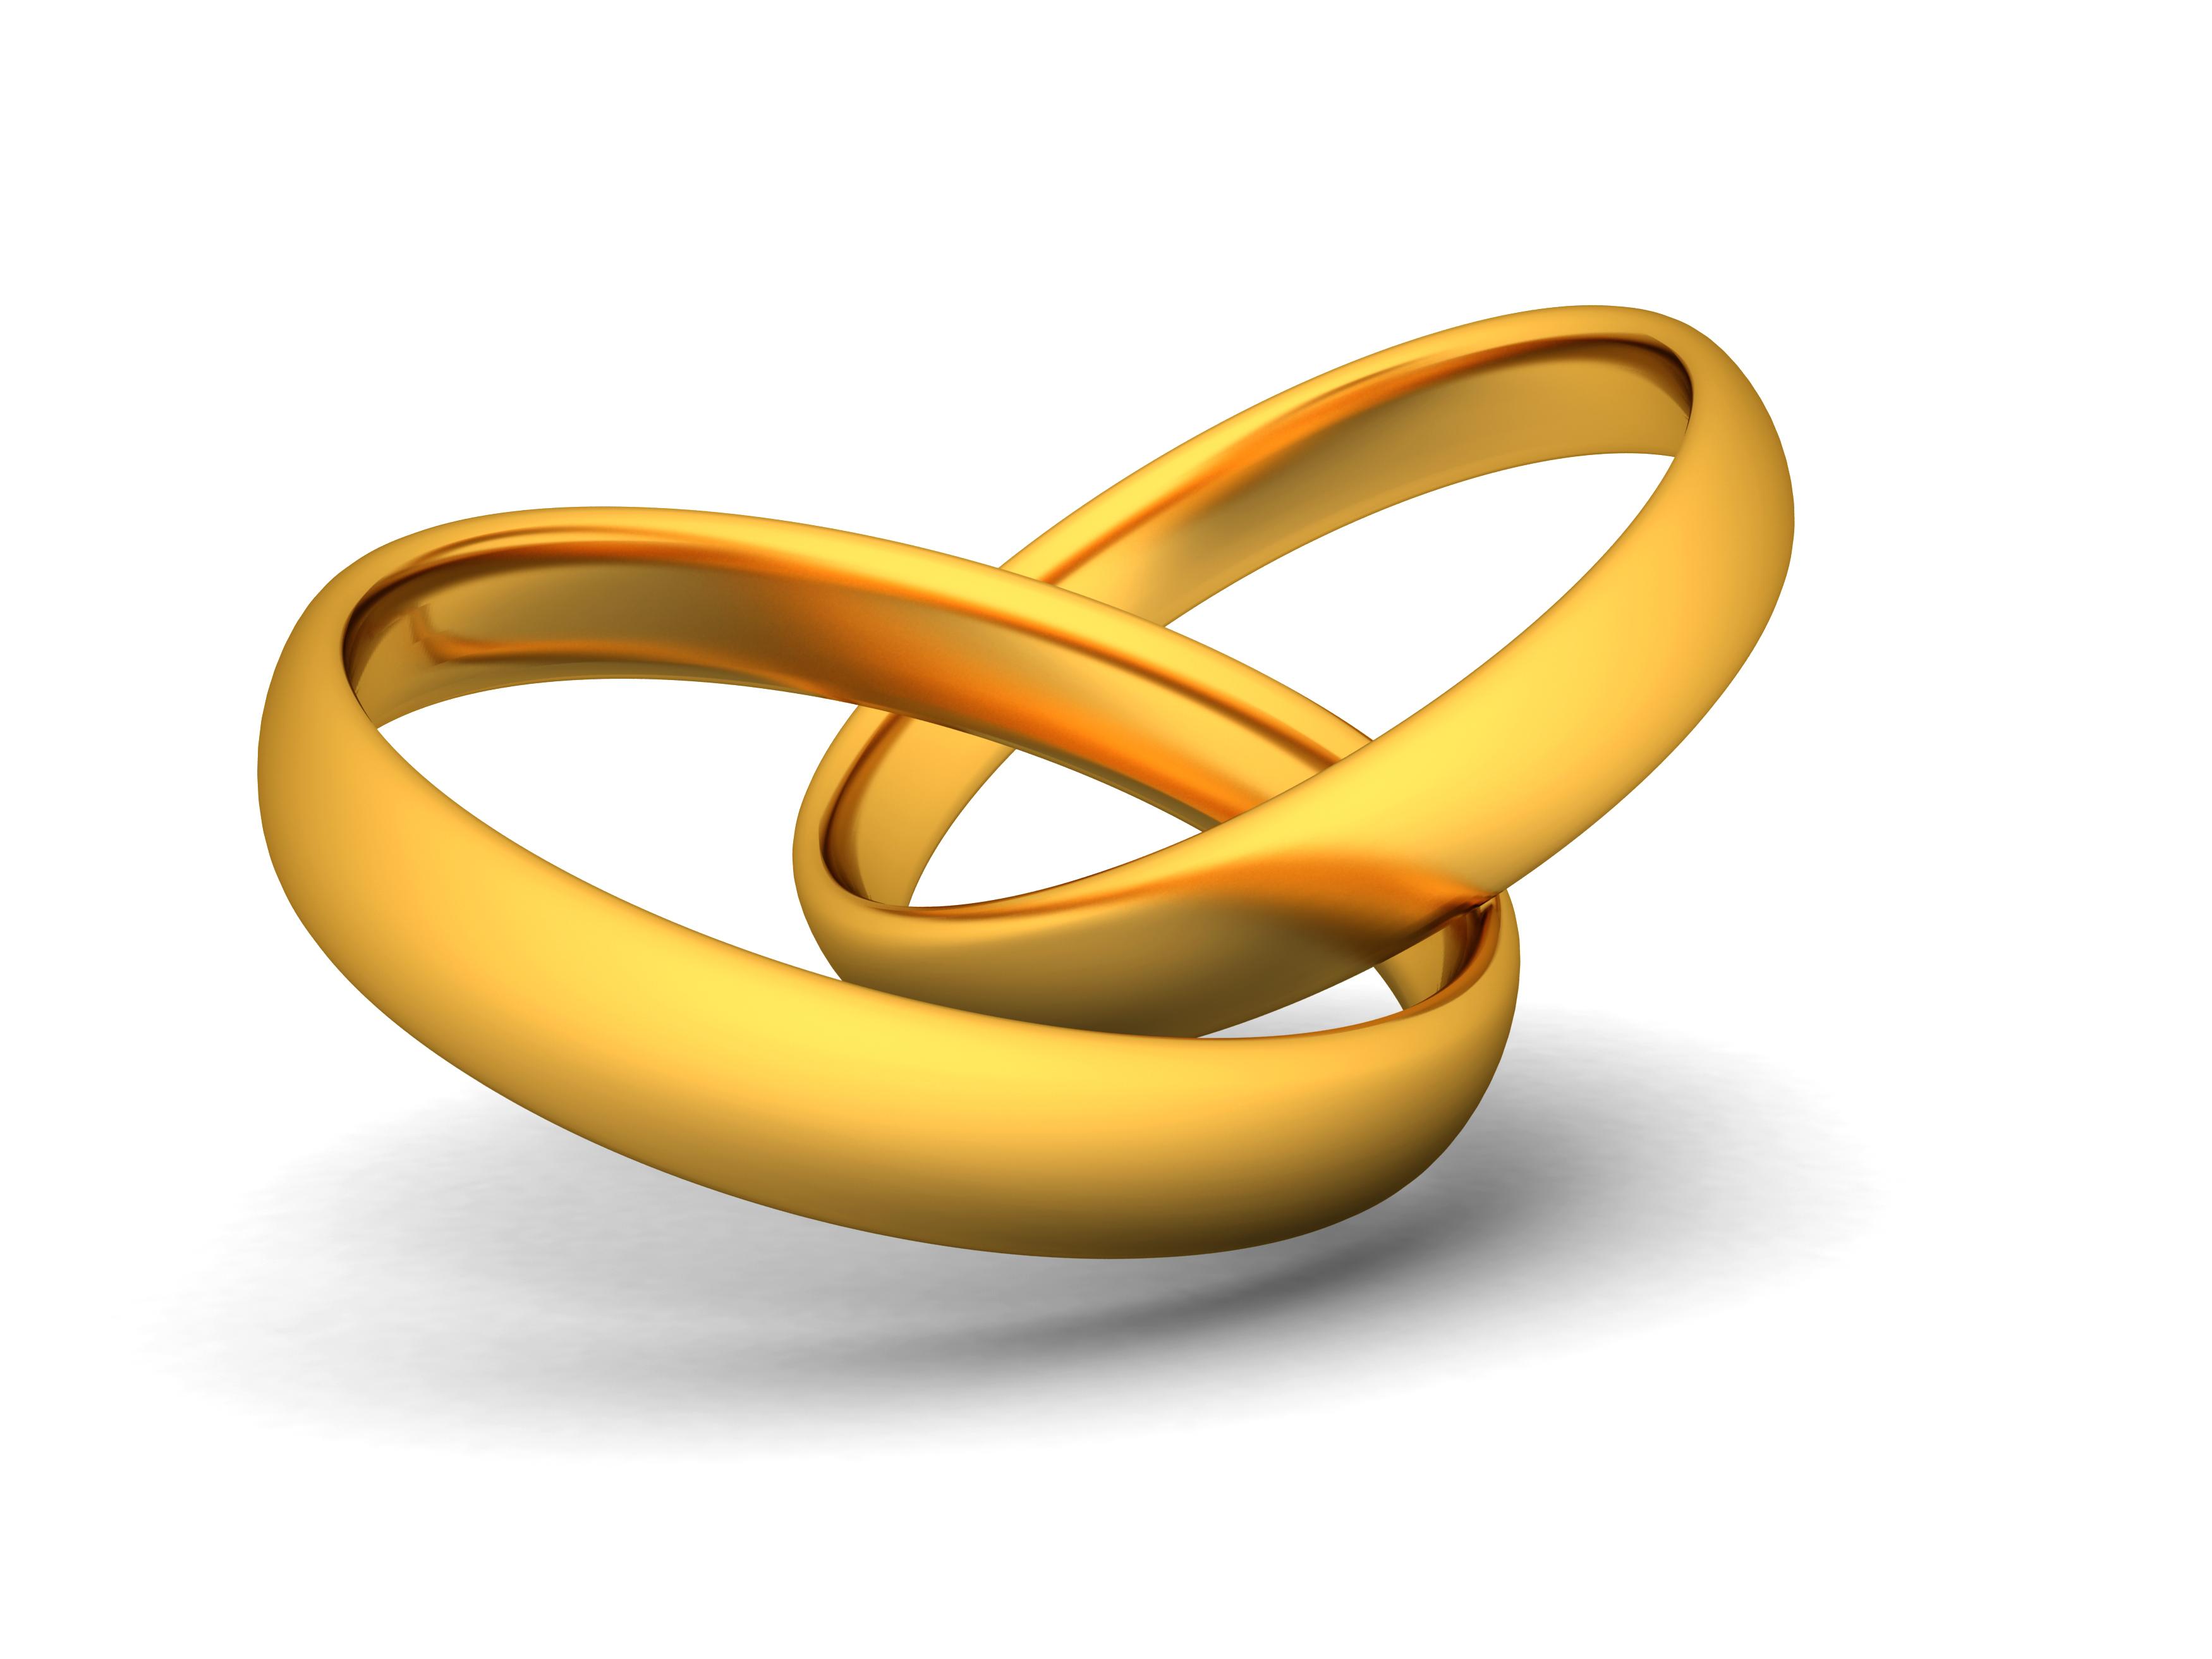 Blue wedding bands clipart clip stock Free Wedding Bands Cliparts, Download Free Clip Art, Free Clip Art ... clip stock